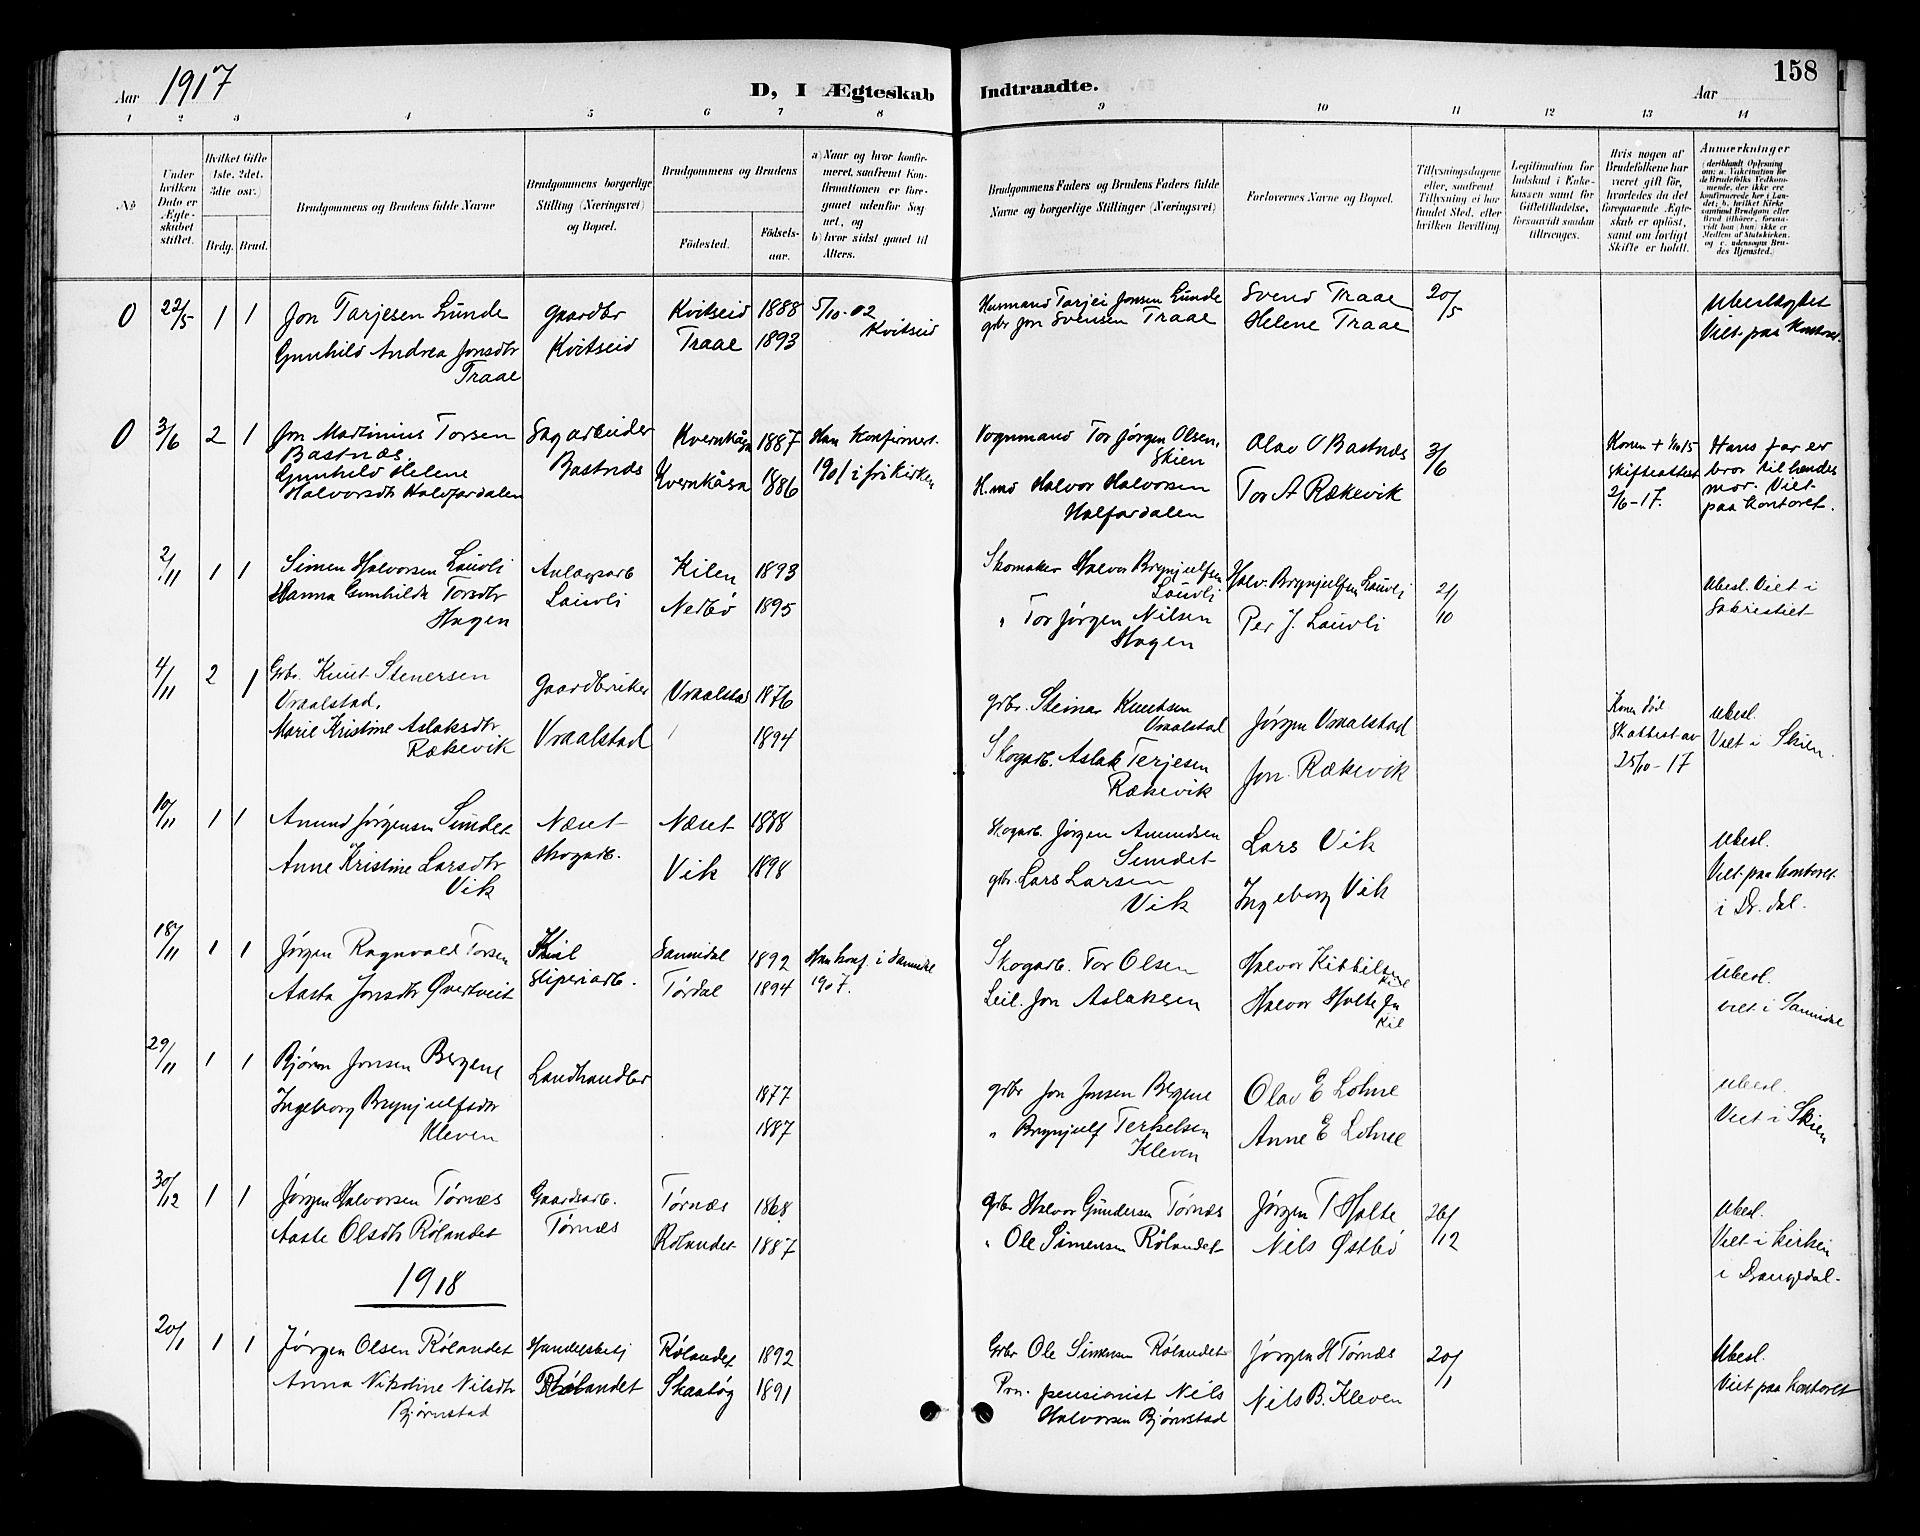 SAKO, Drangedal kirkebøker, G/Gb/L0002: Klokkerbok nr. II 2, 1895-1918, s. 158